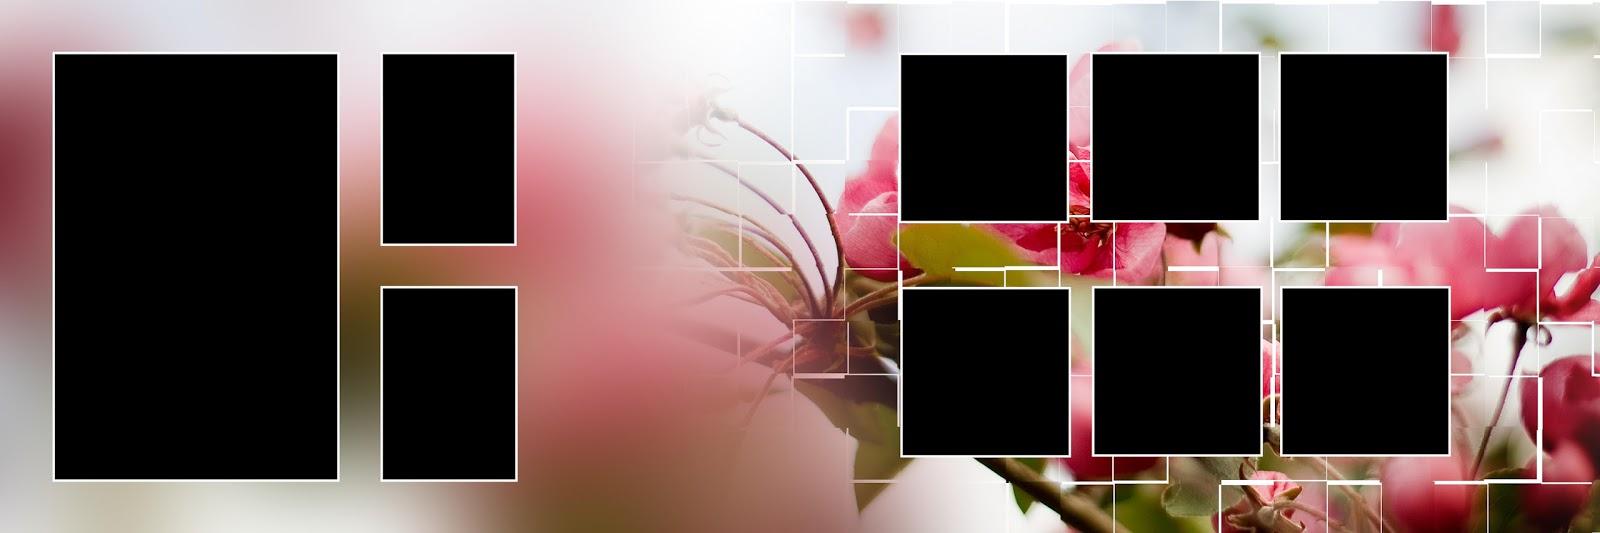 keygen light image resizer 4 7Km